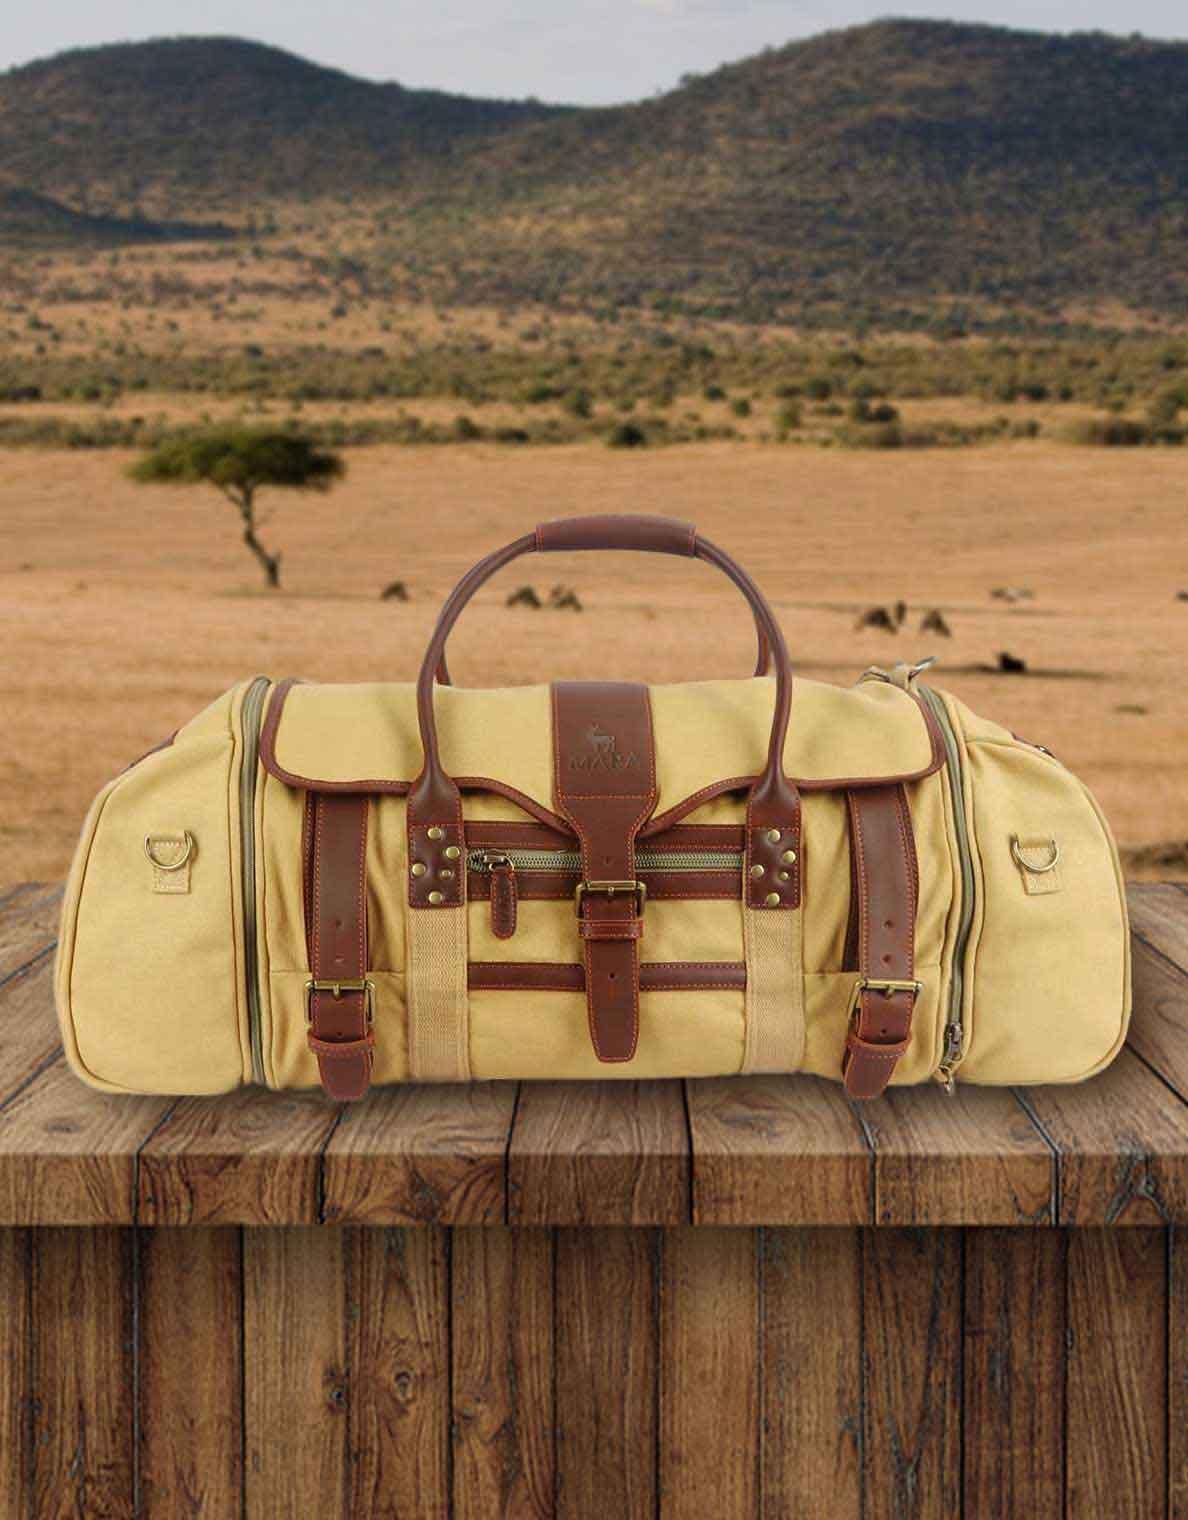 Voyager Southern Cross Safari Luggage Bag Cover